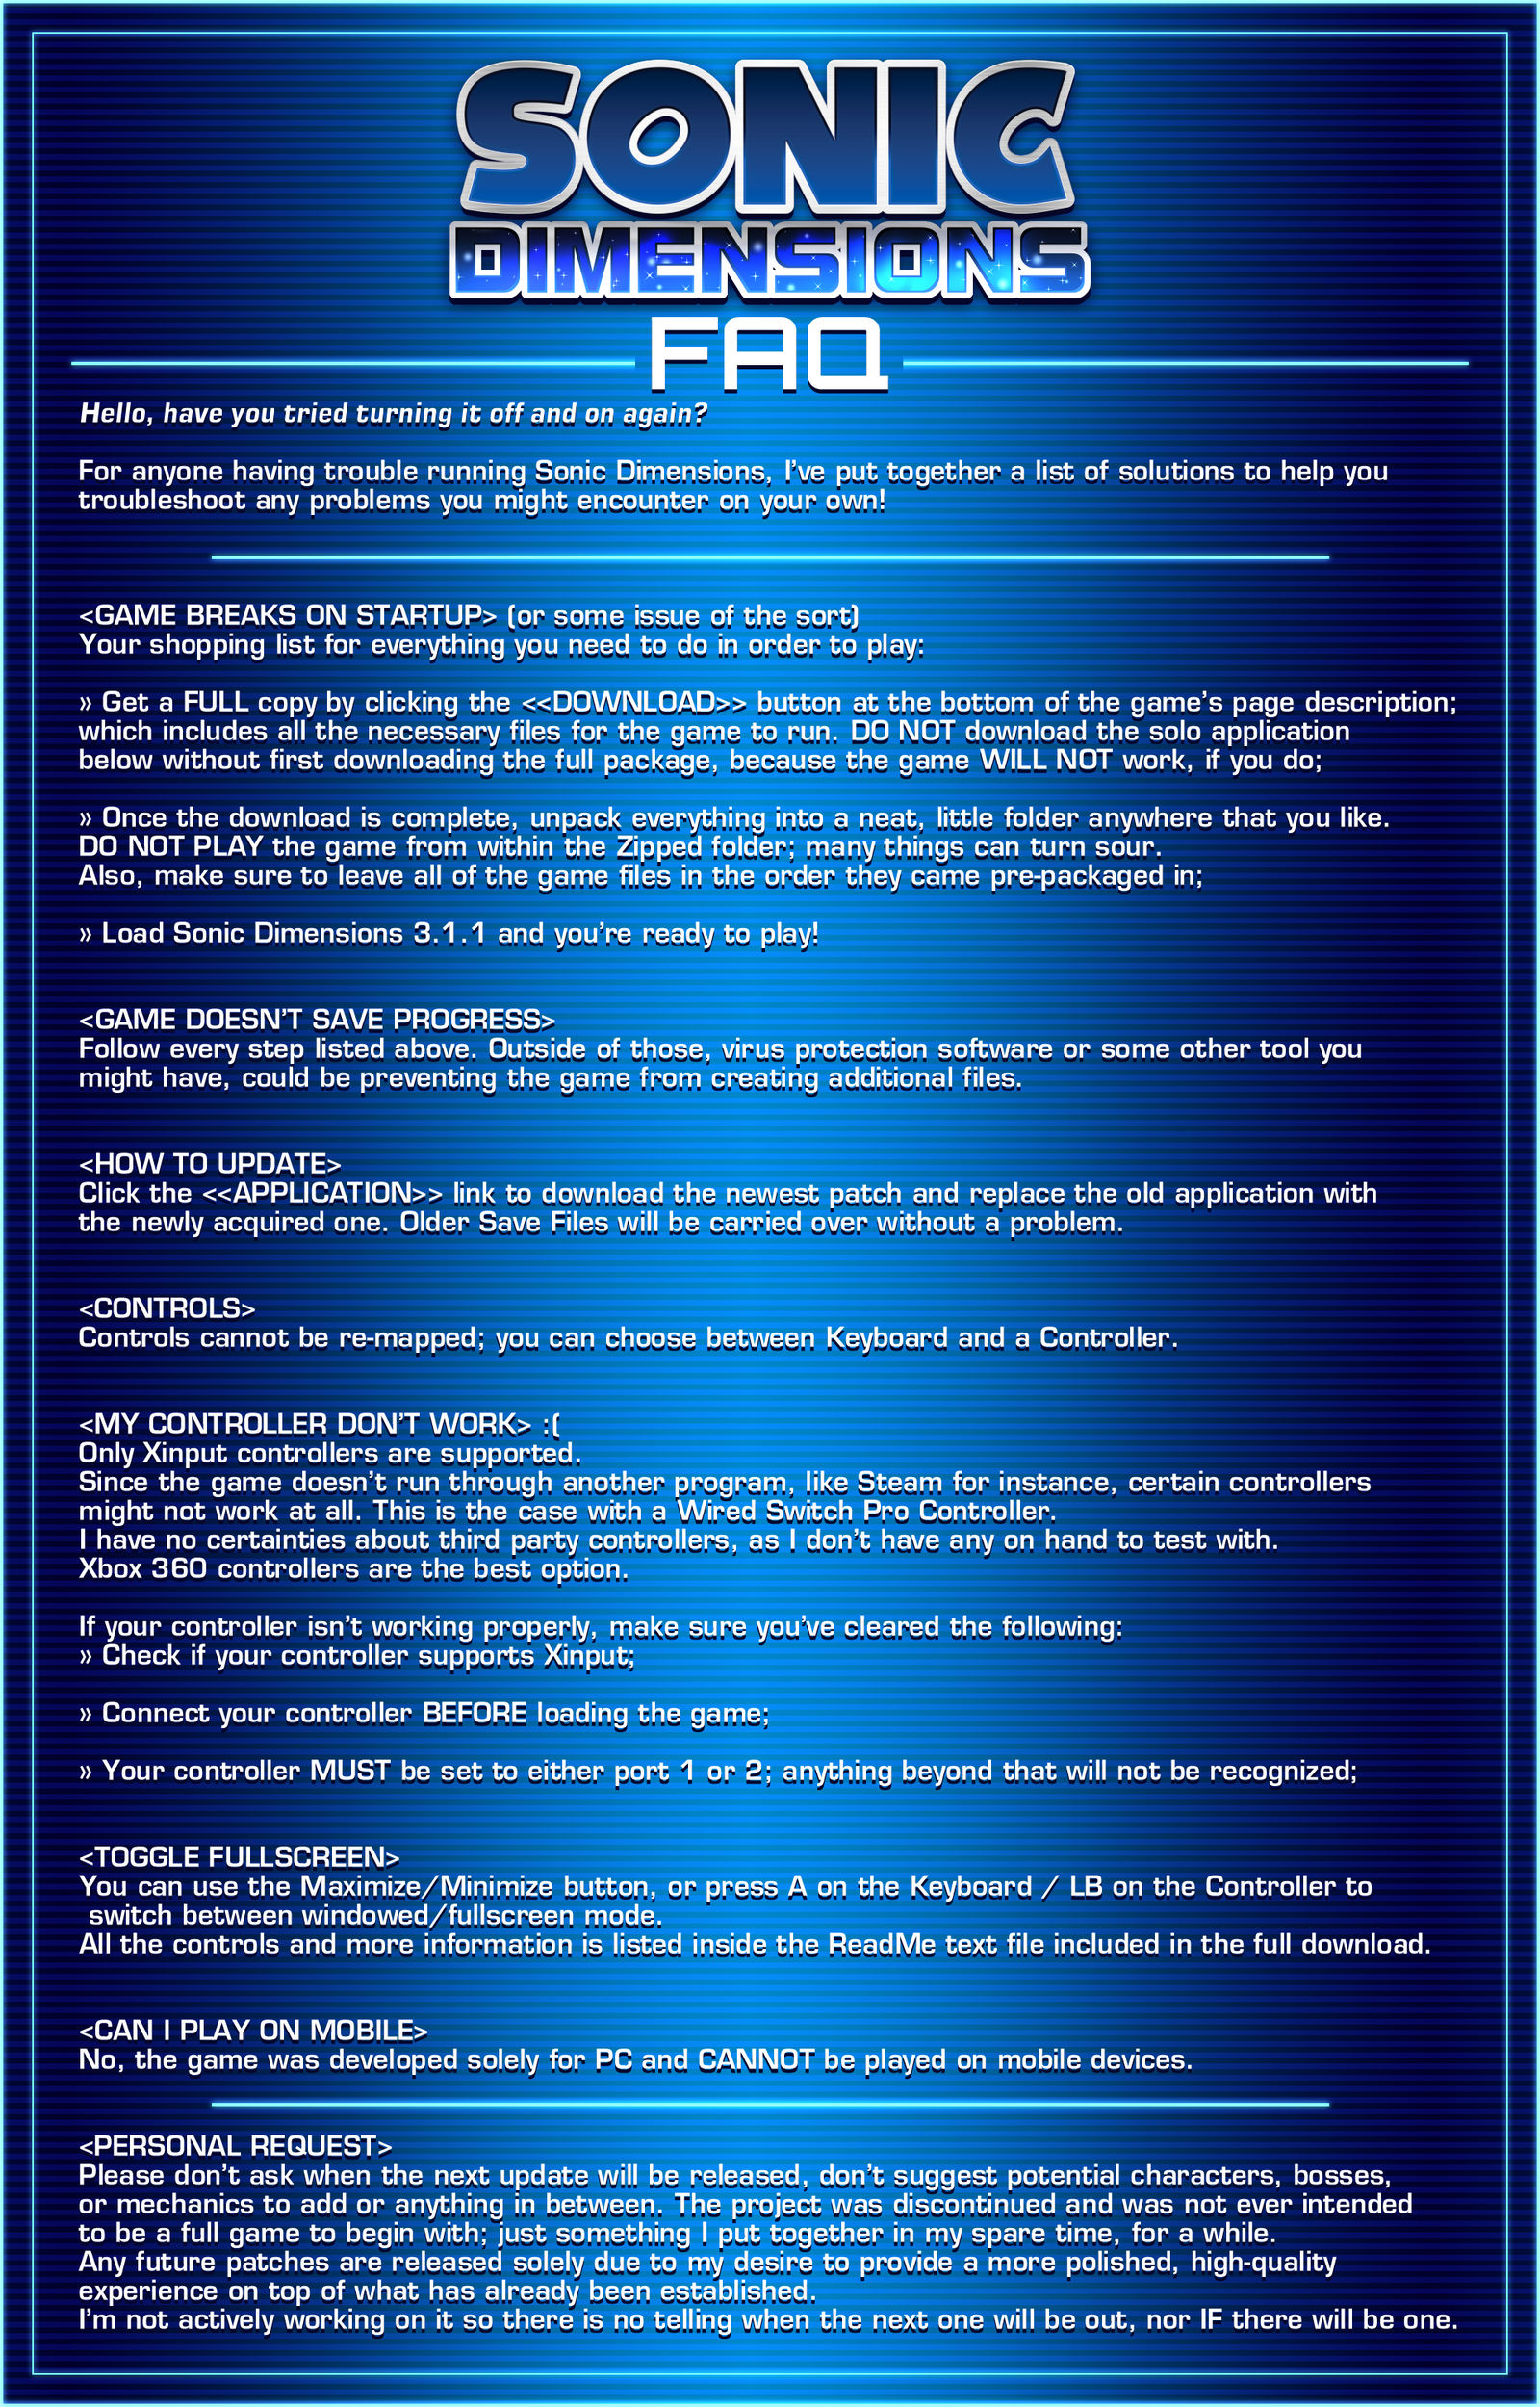 Sonic Dimensions FAQ by Phantom-Radea on DeviantArt